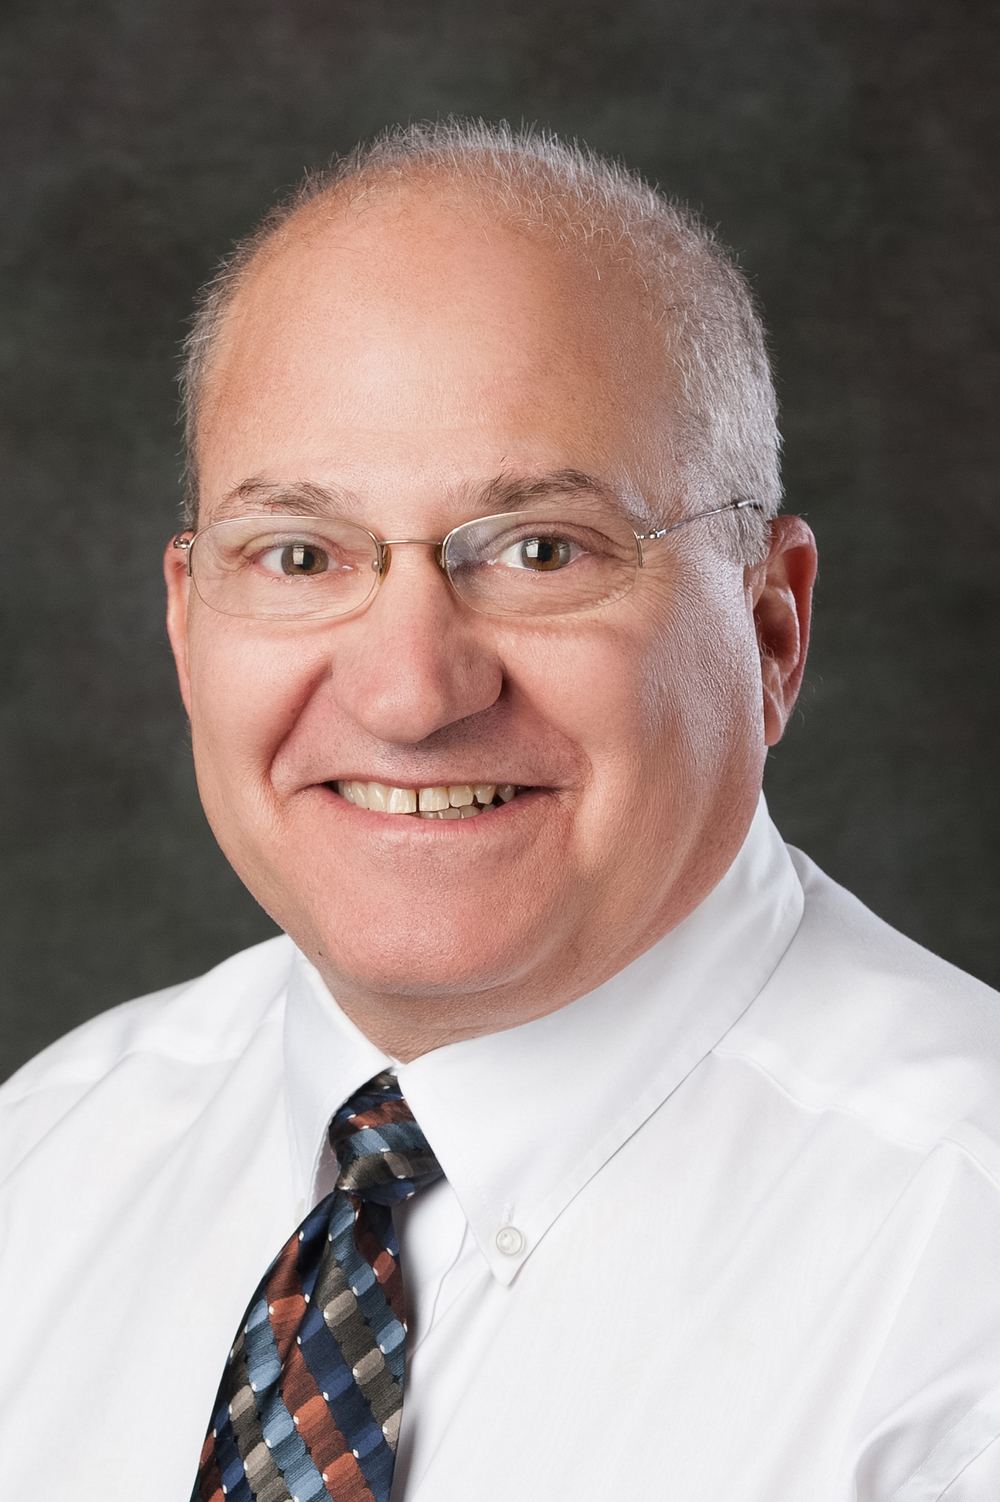 Byron Blasko, Jr., ARNP